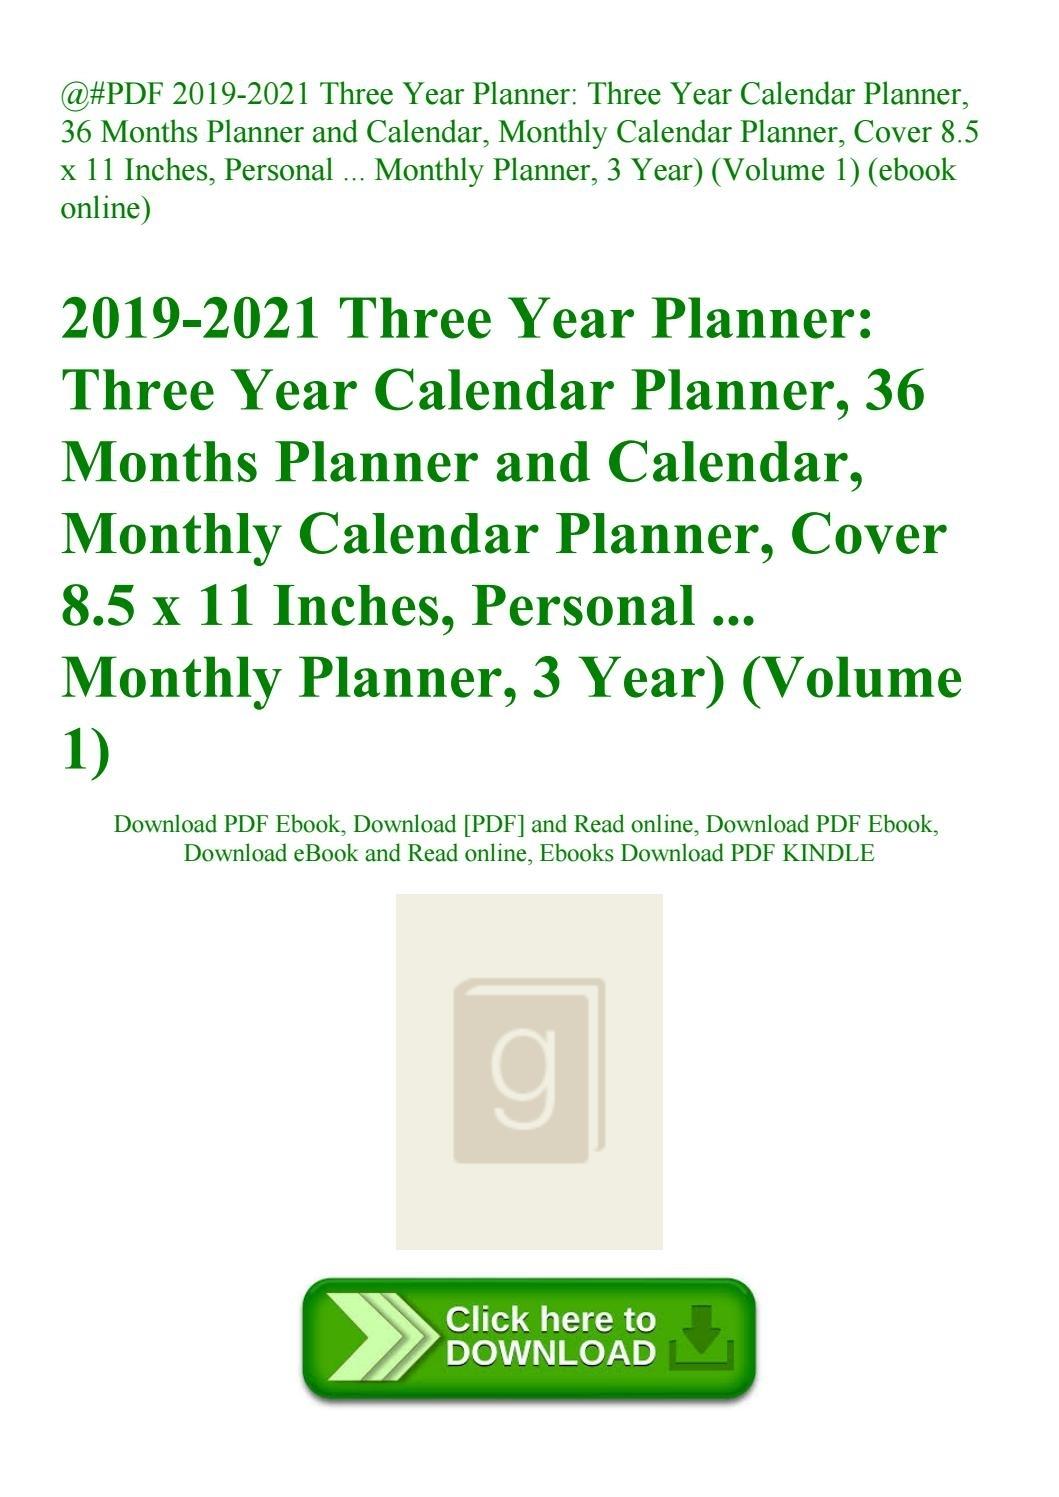 Pdf 2019-2021 Three Year Planner Three Year Calendar Planner